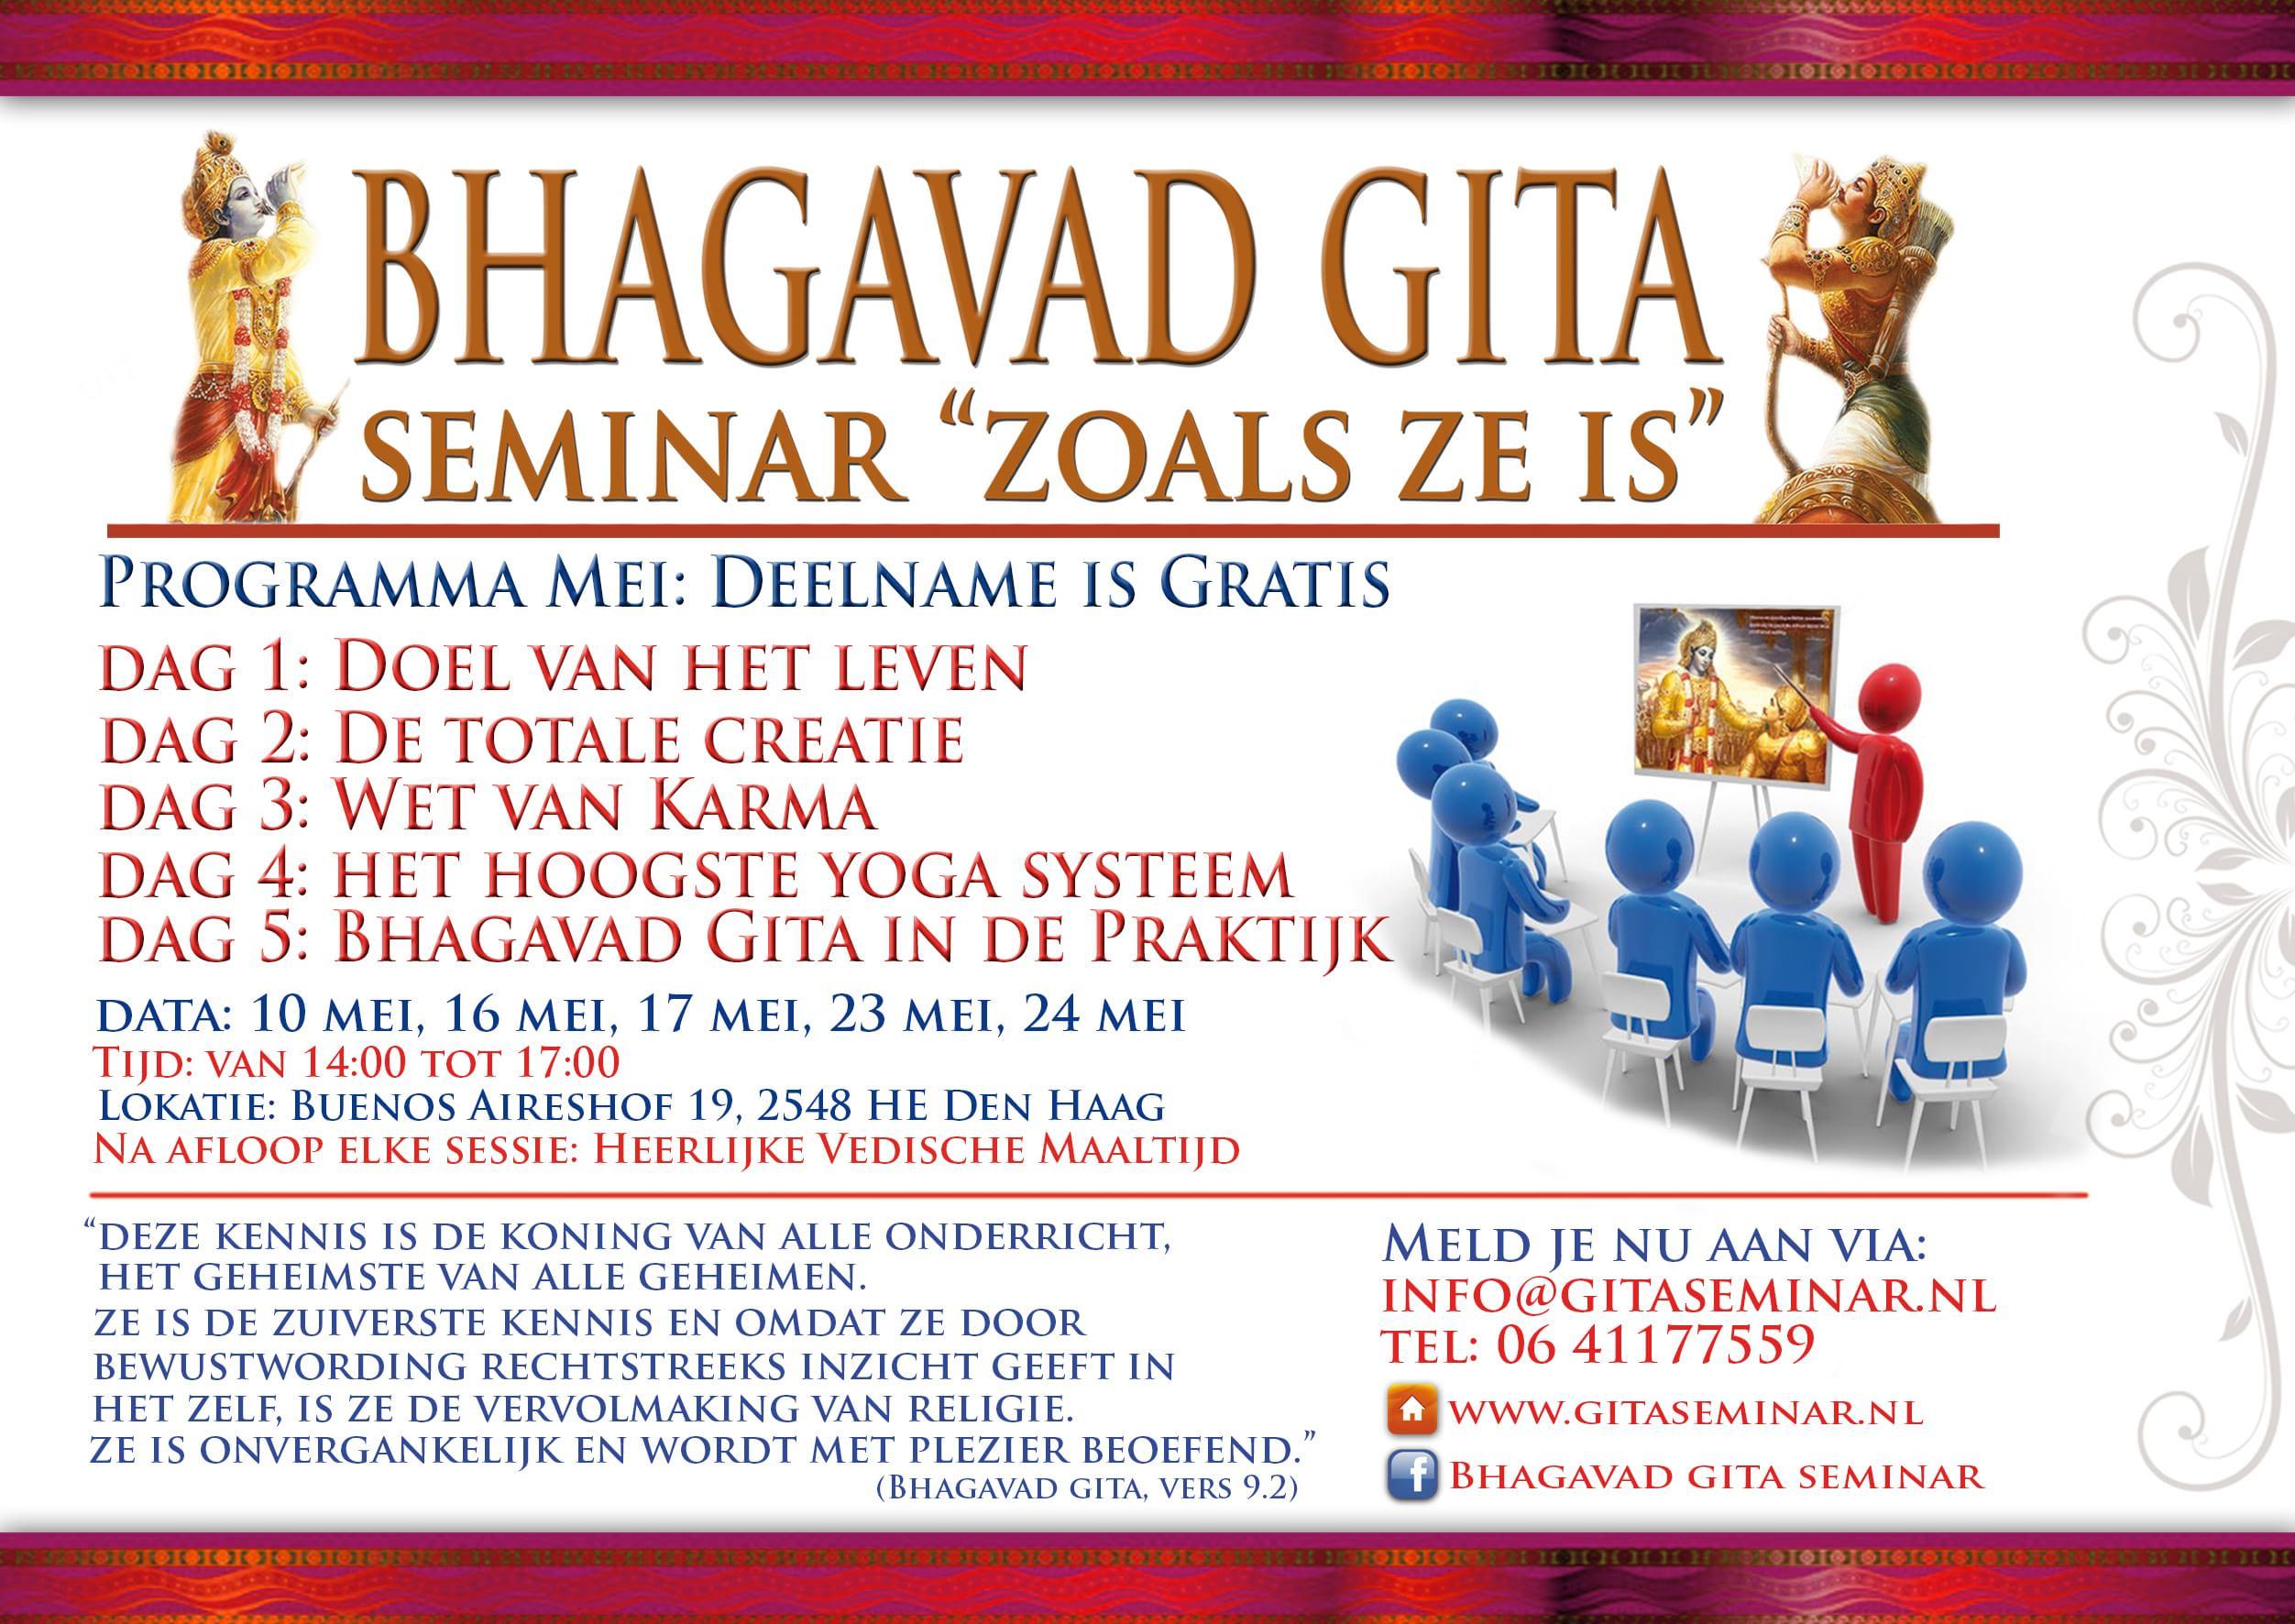 Citaten Uit De Bhagavad Gita : Bhagavad gita seminar mei sessie